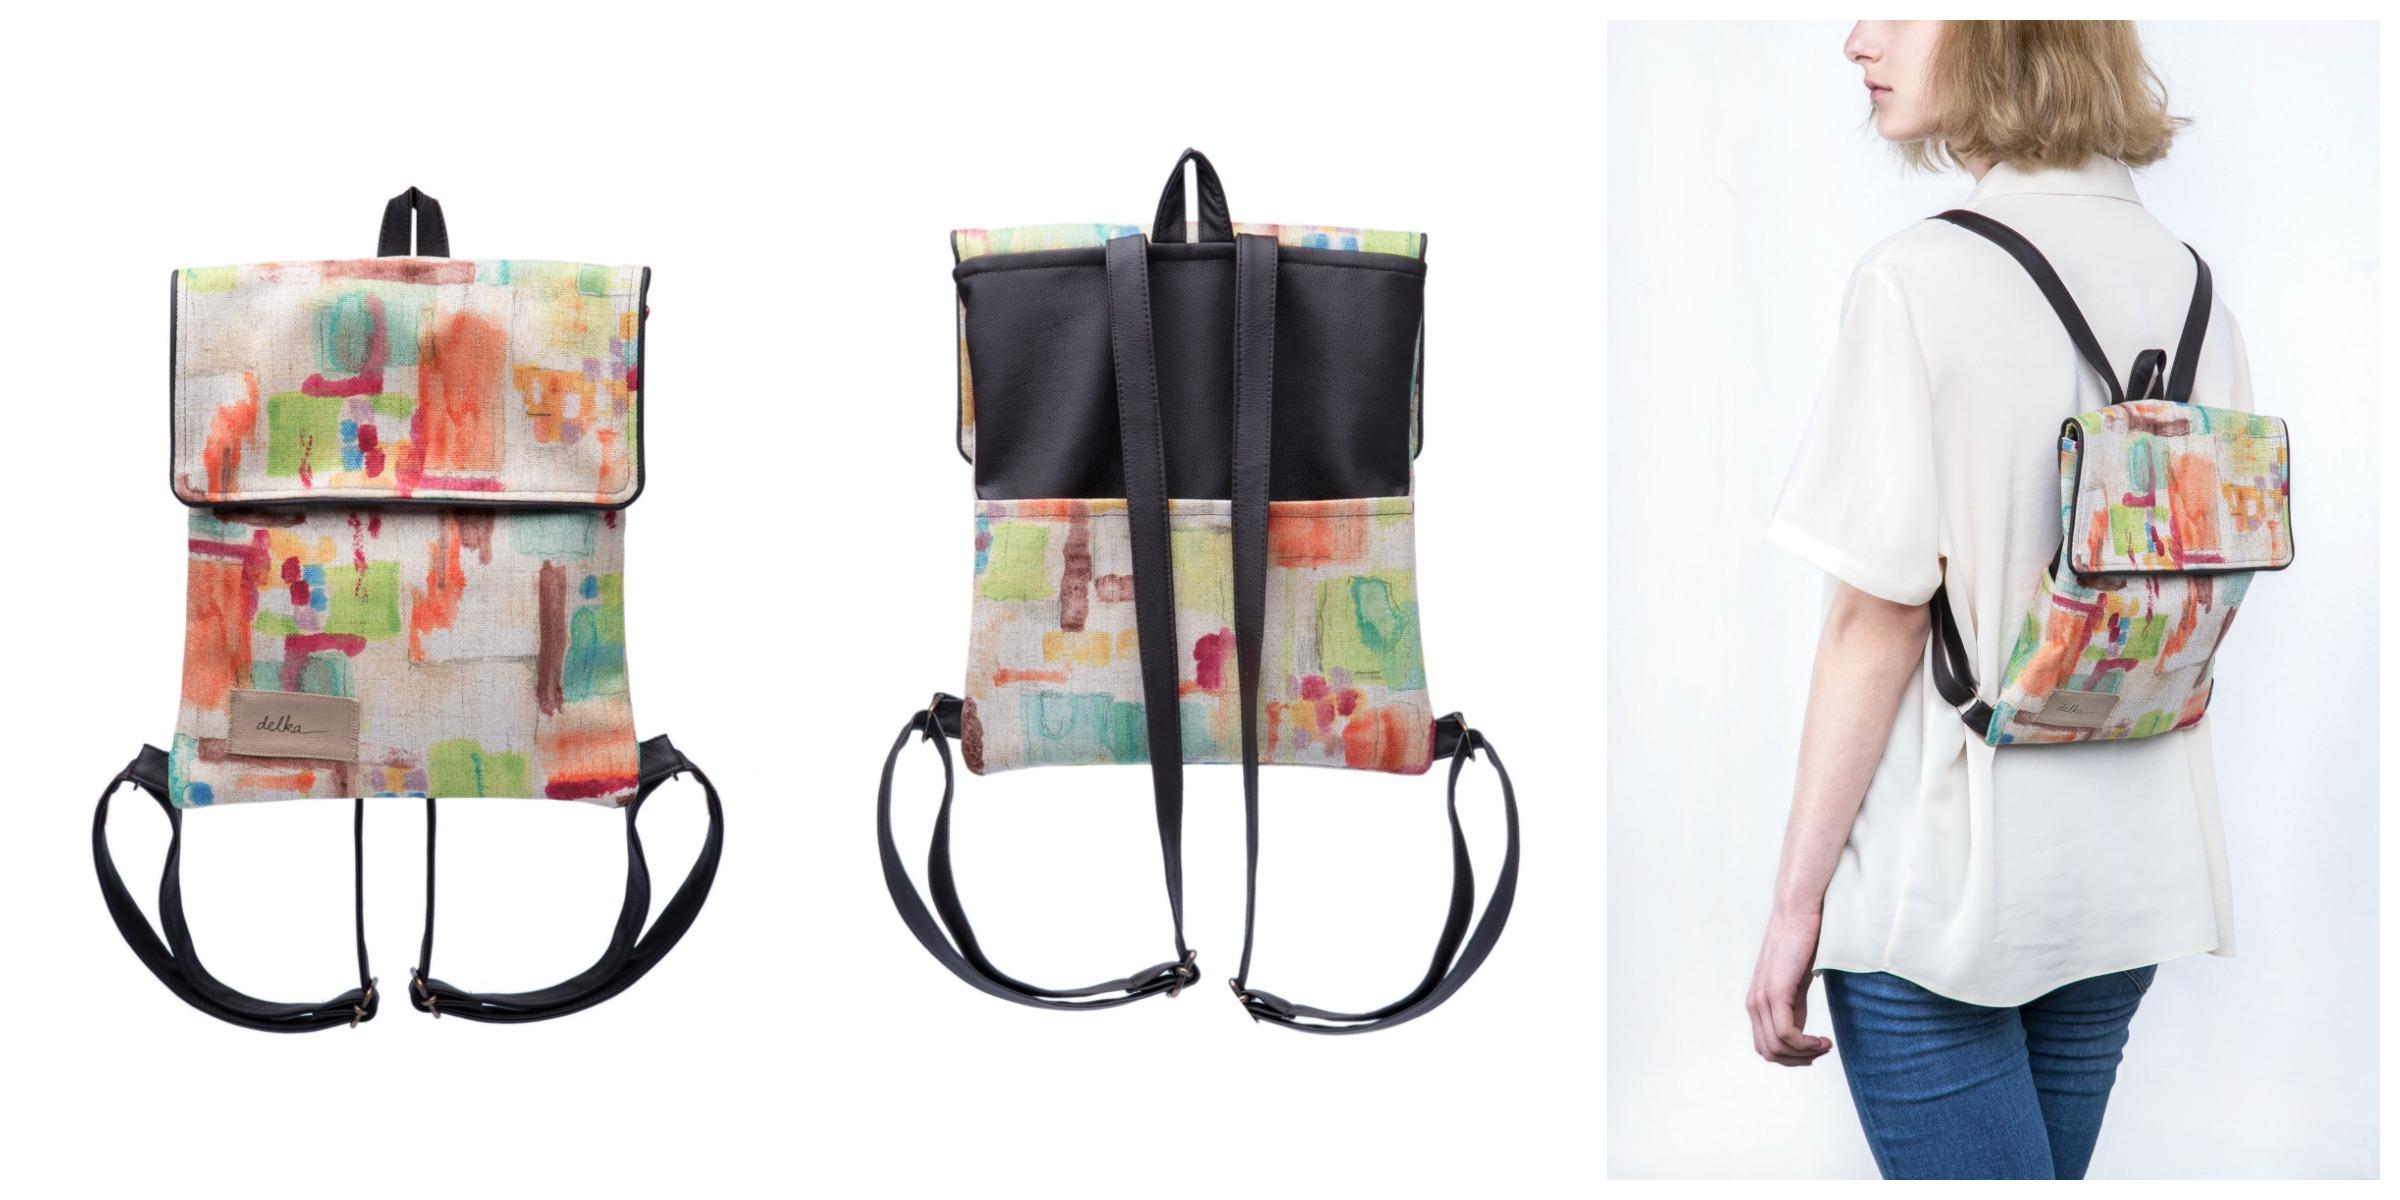 026e75a8bf95 Vagány táskák a hétköznapokra - PandArte